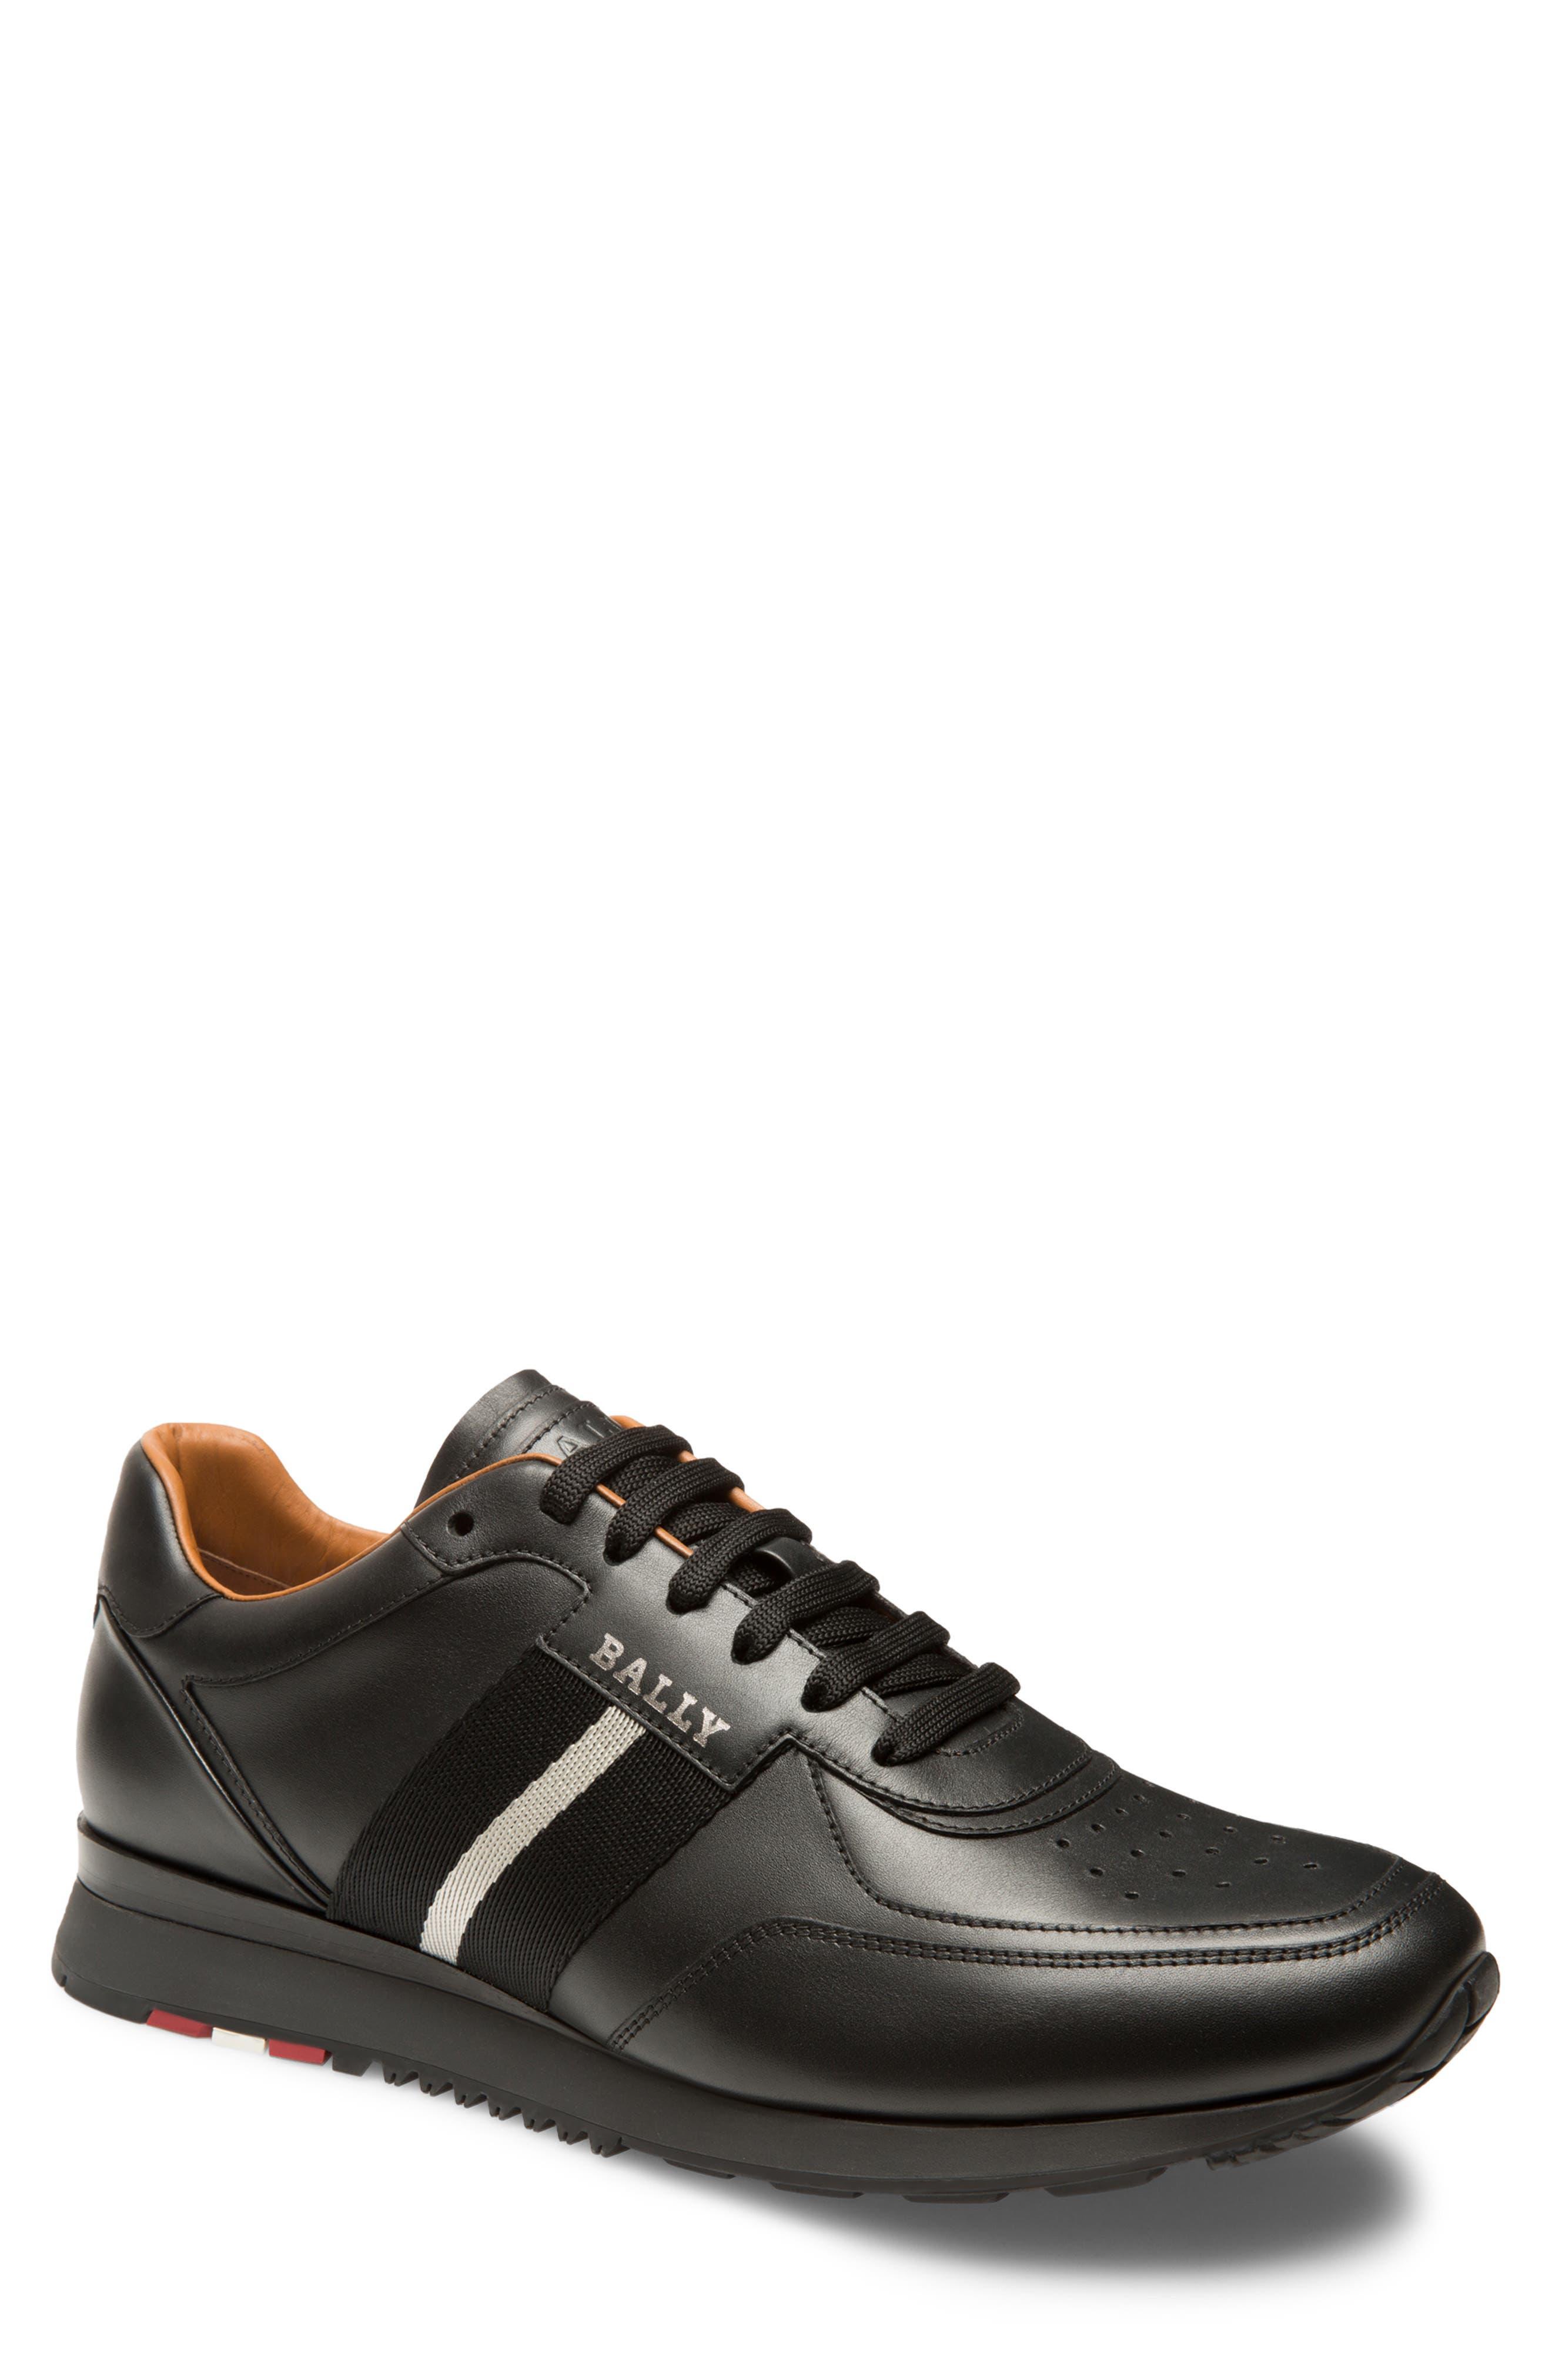 Men's Bally Shoes | Nordstrom